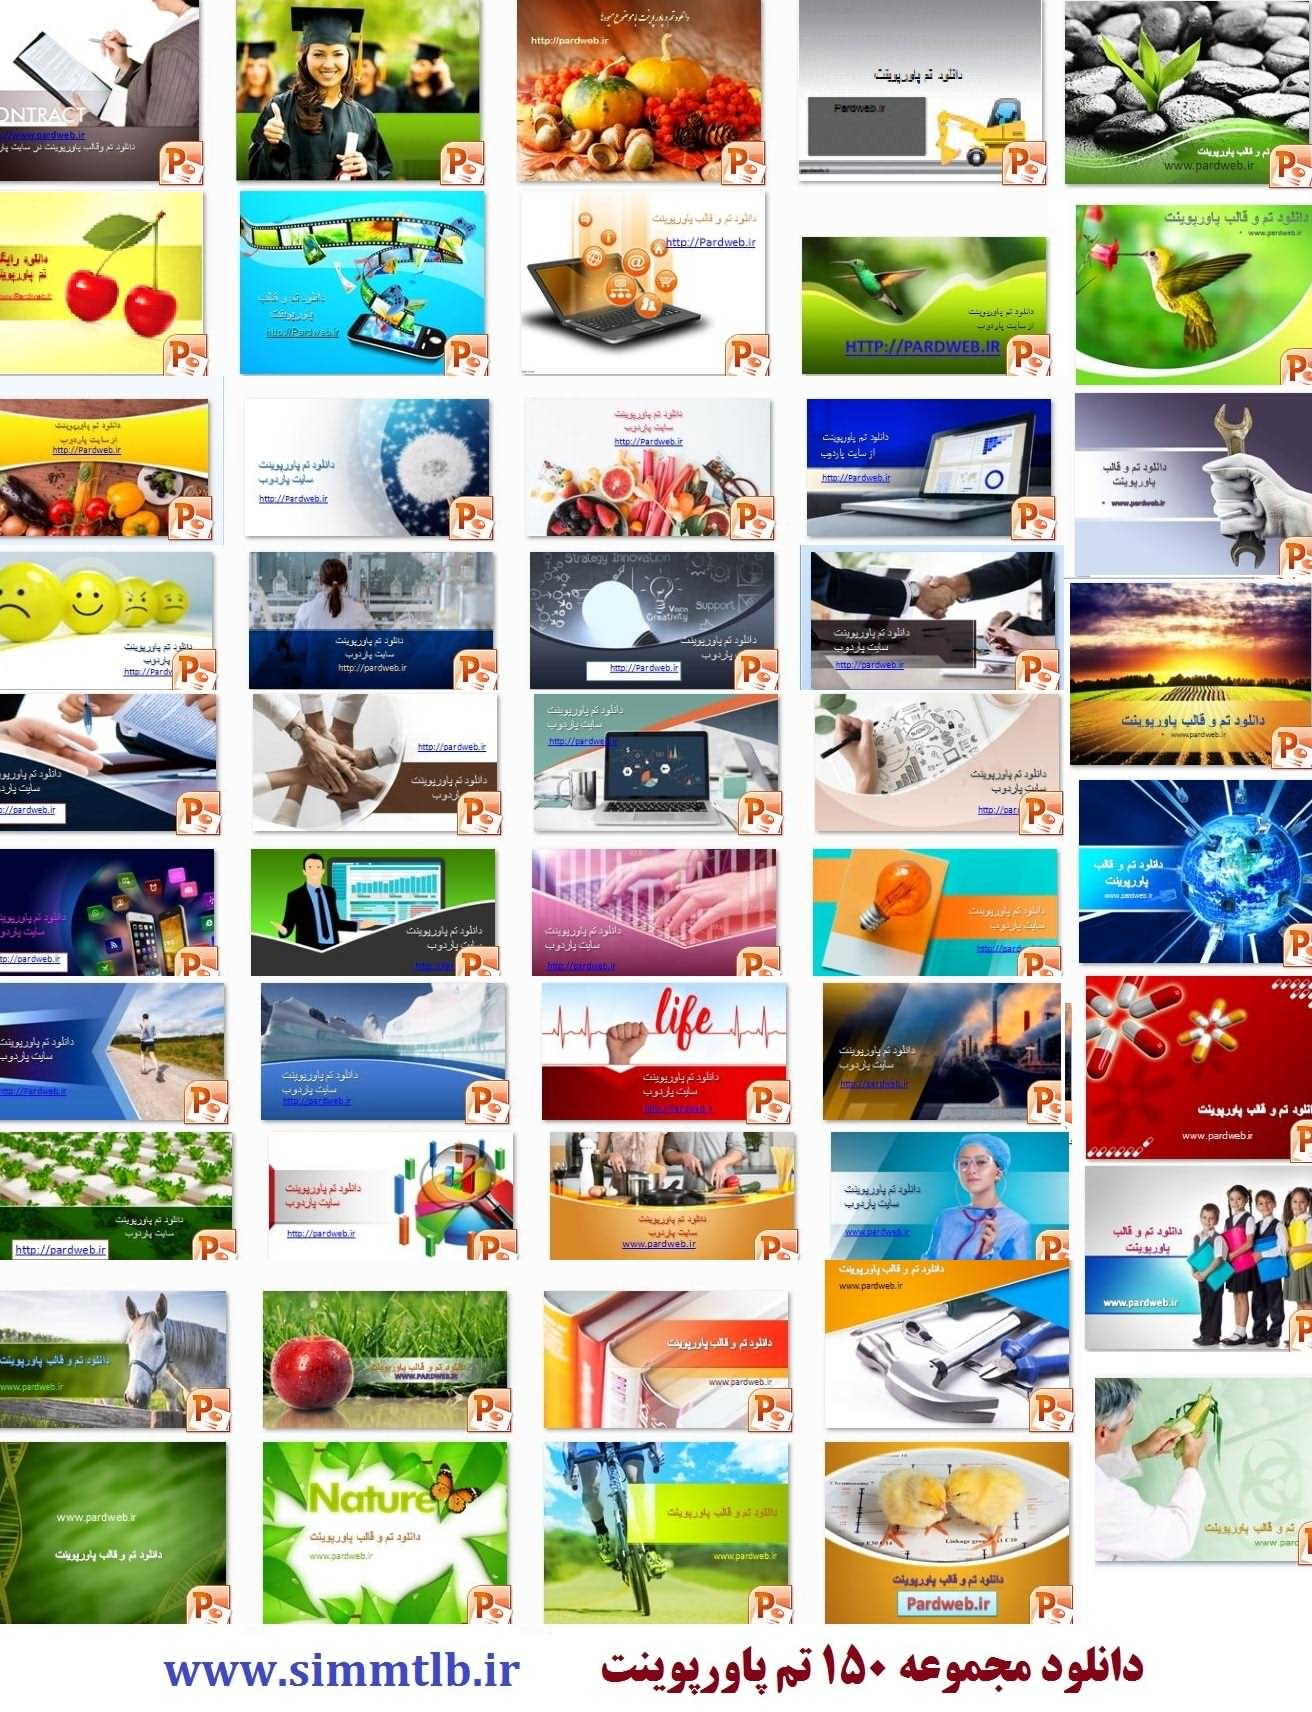 دانلود 150 قالب پاورپوینت علمی و گوناگون